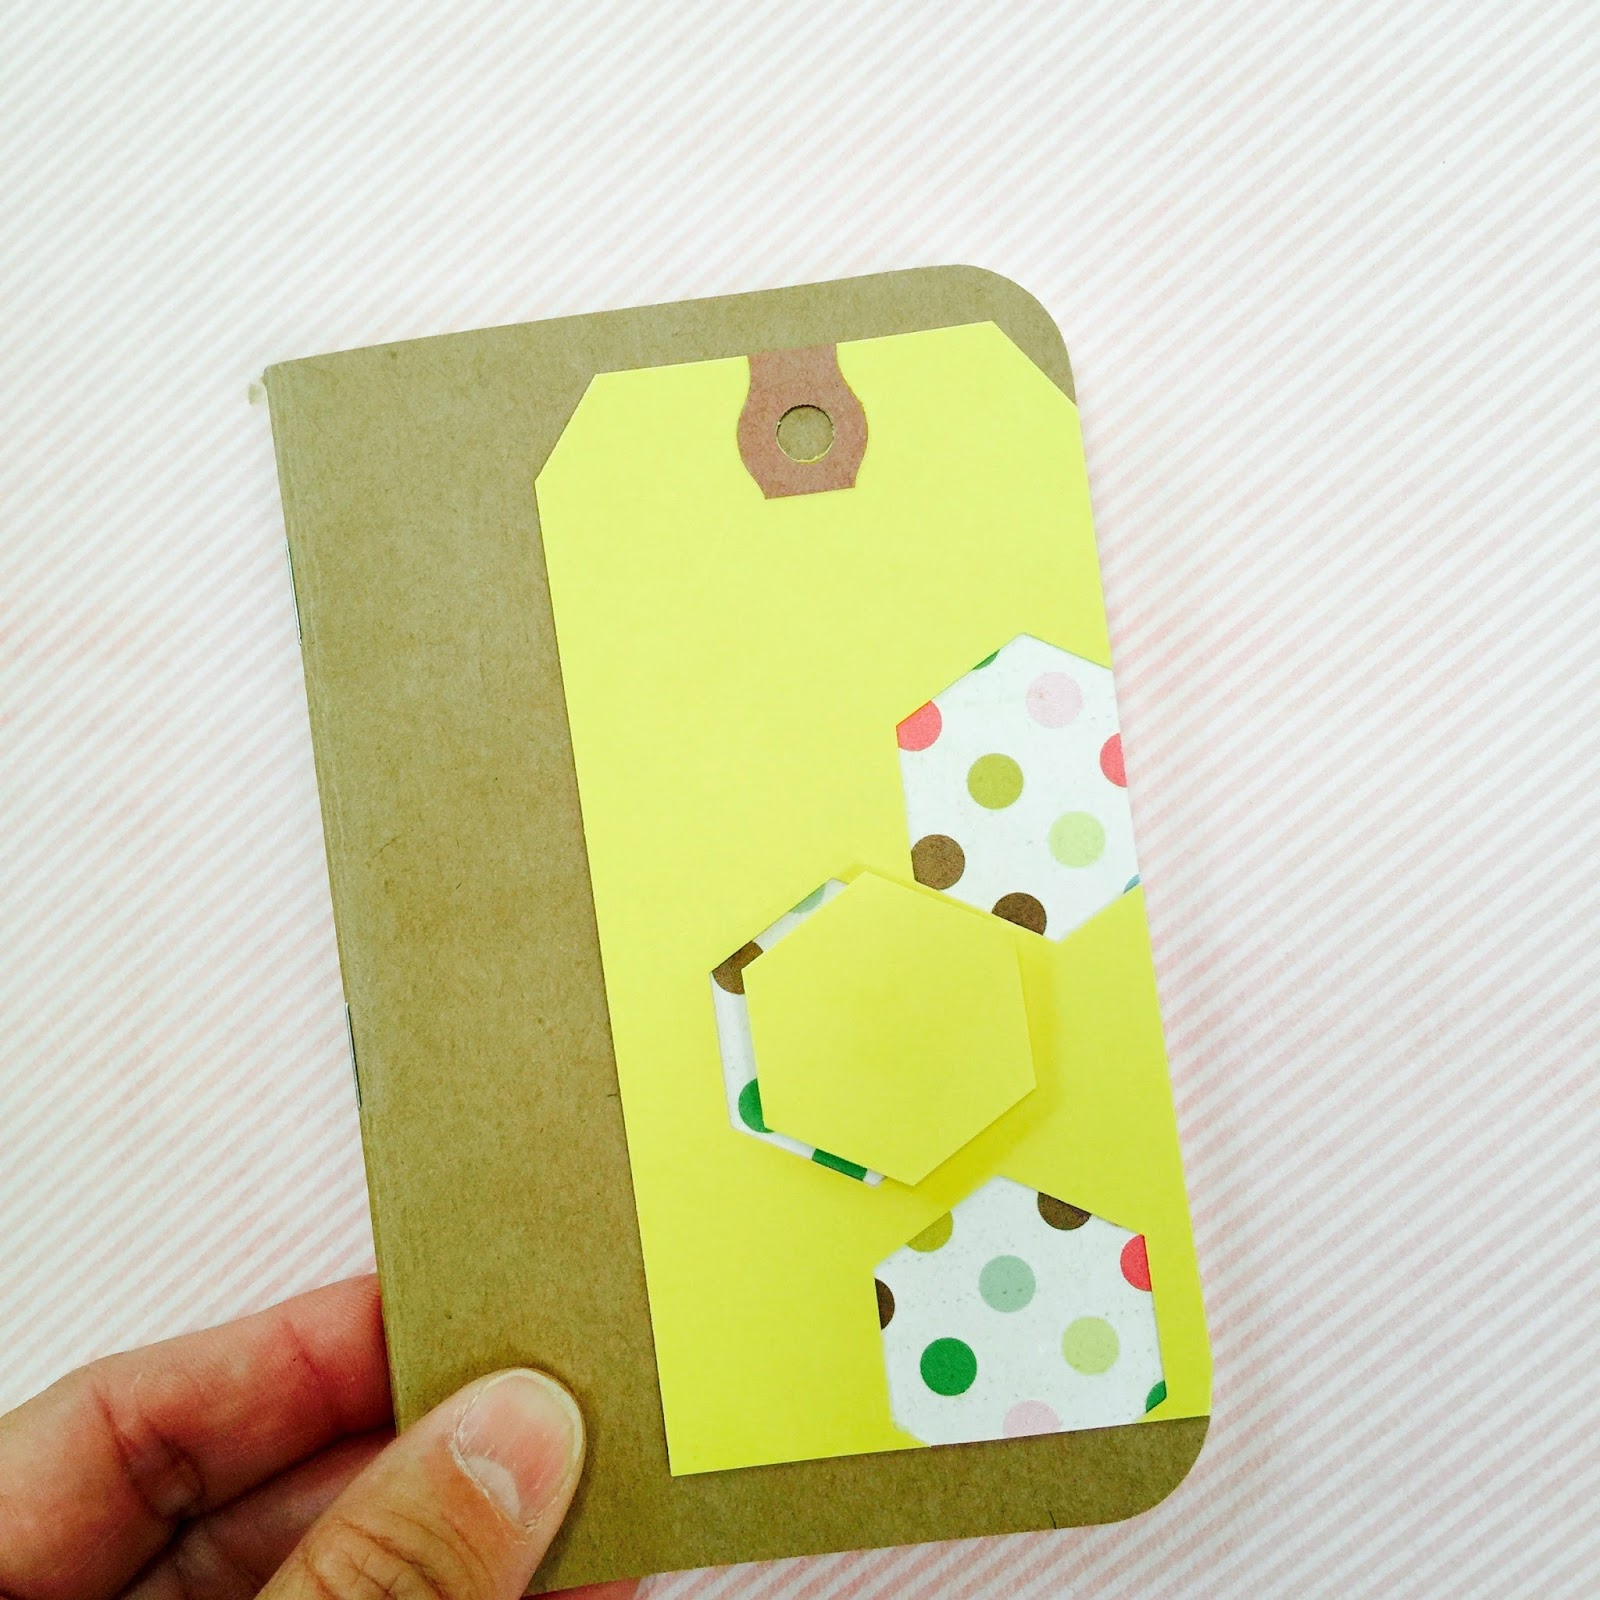 #hexagon #shipping tag #tag #yellow #polka dot